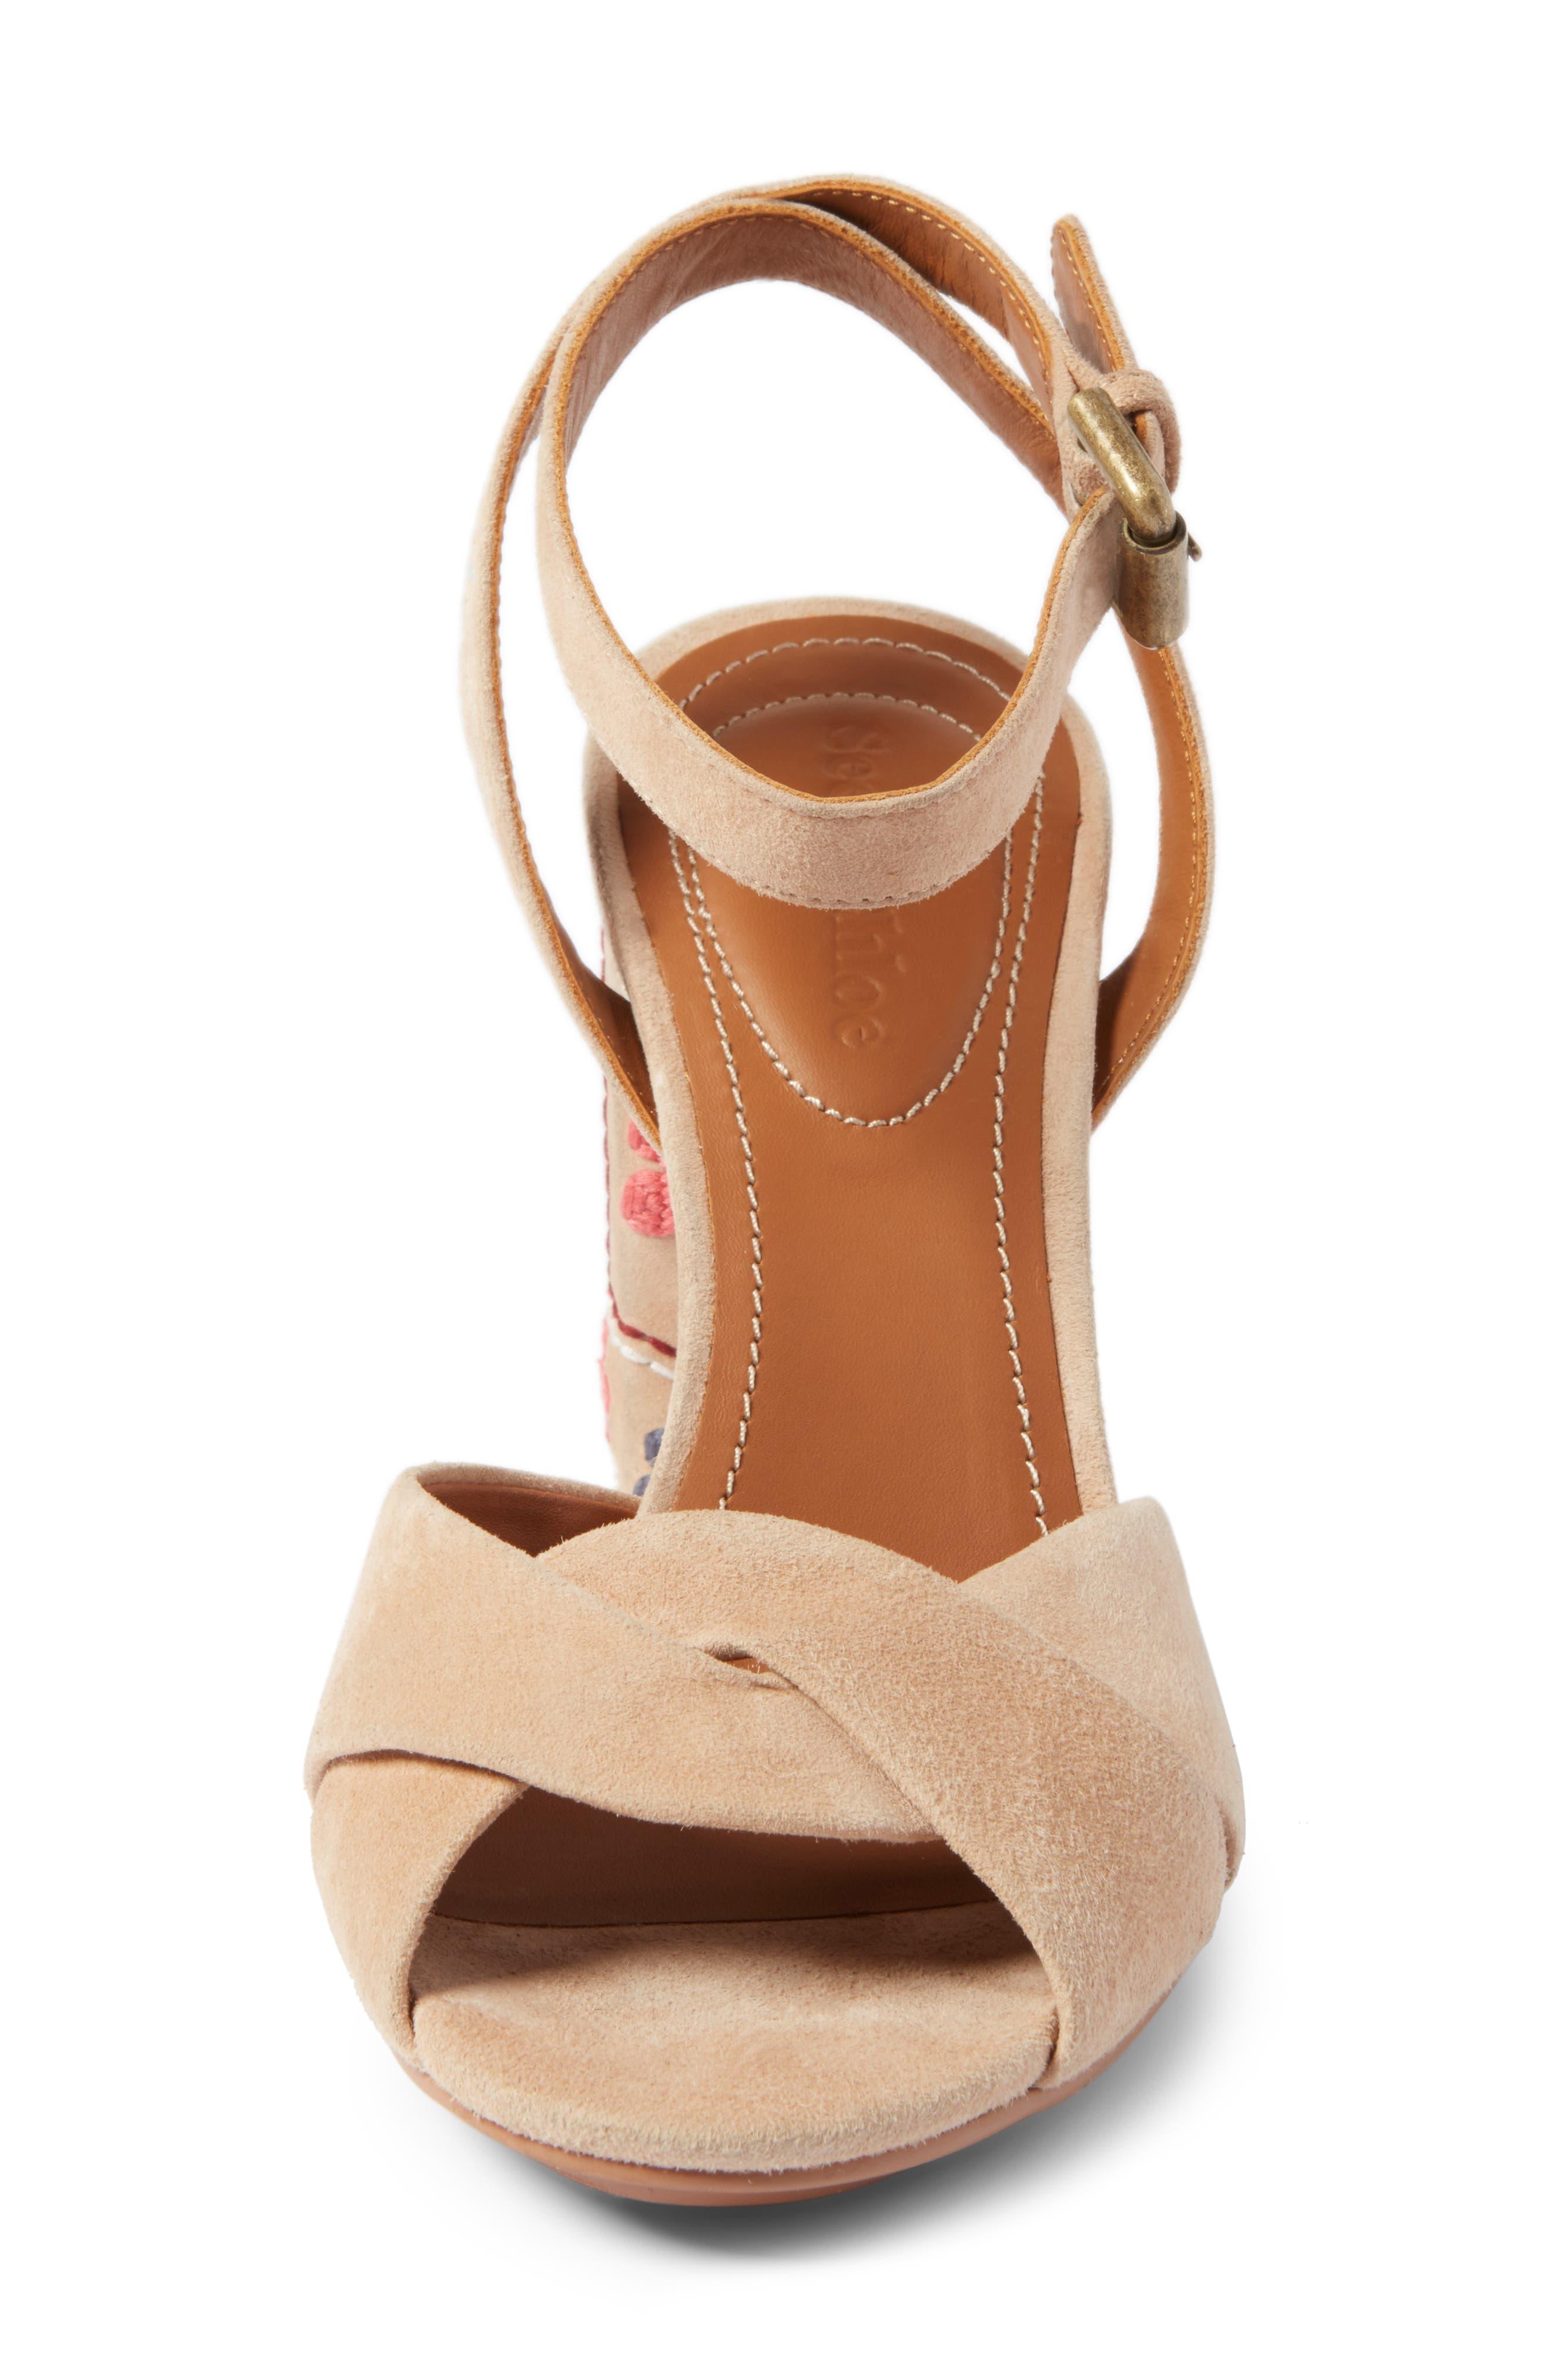 Gayla Embroidered Block Heel Sandal,                             Alternate thumbnail 4, color,                             250